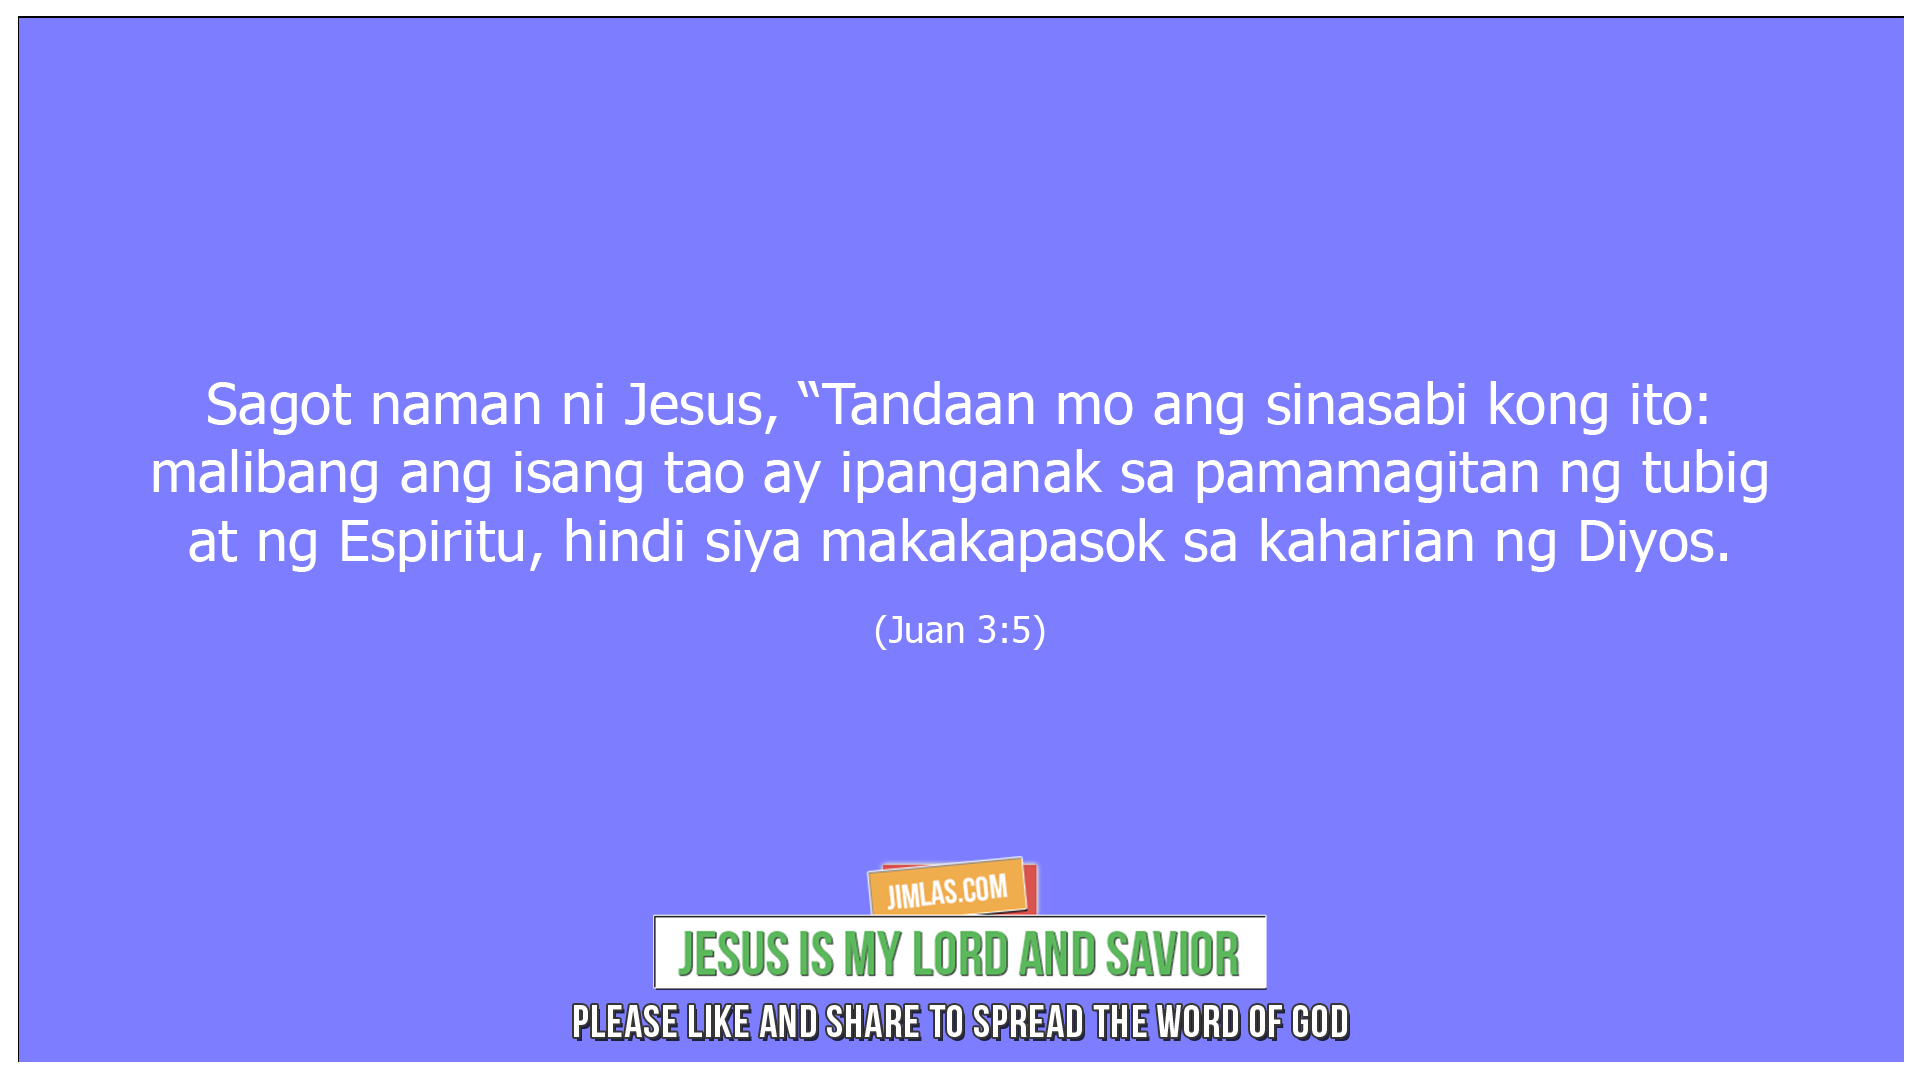 Juan 3 5, Juan 3:5